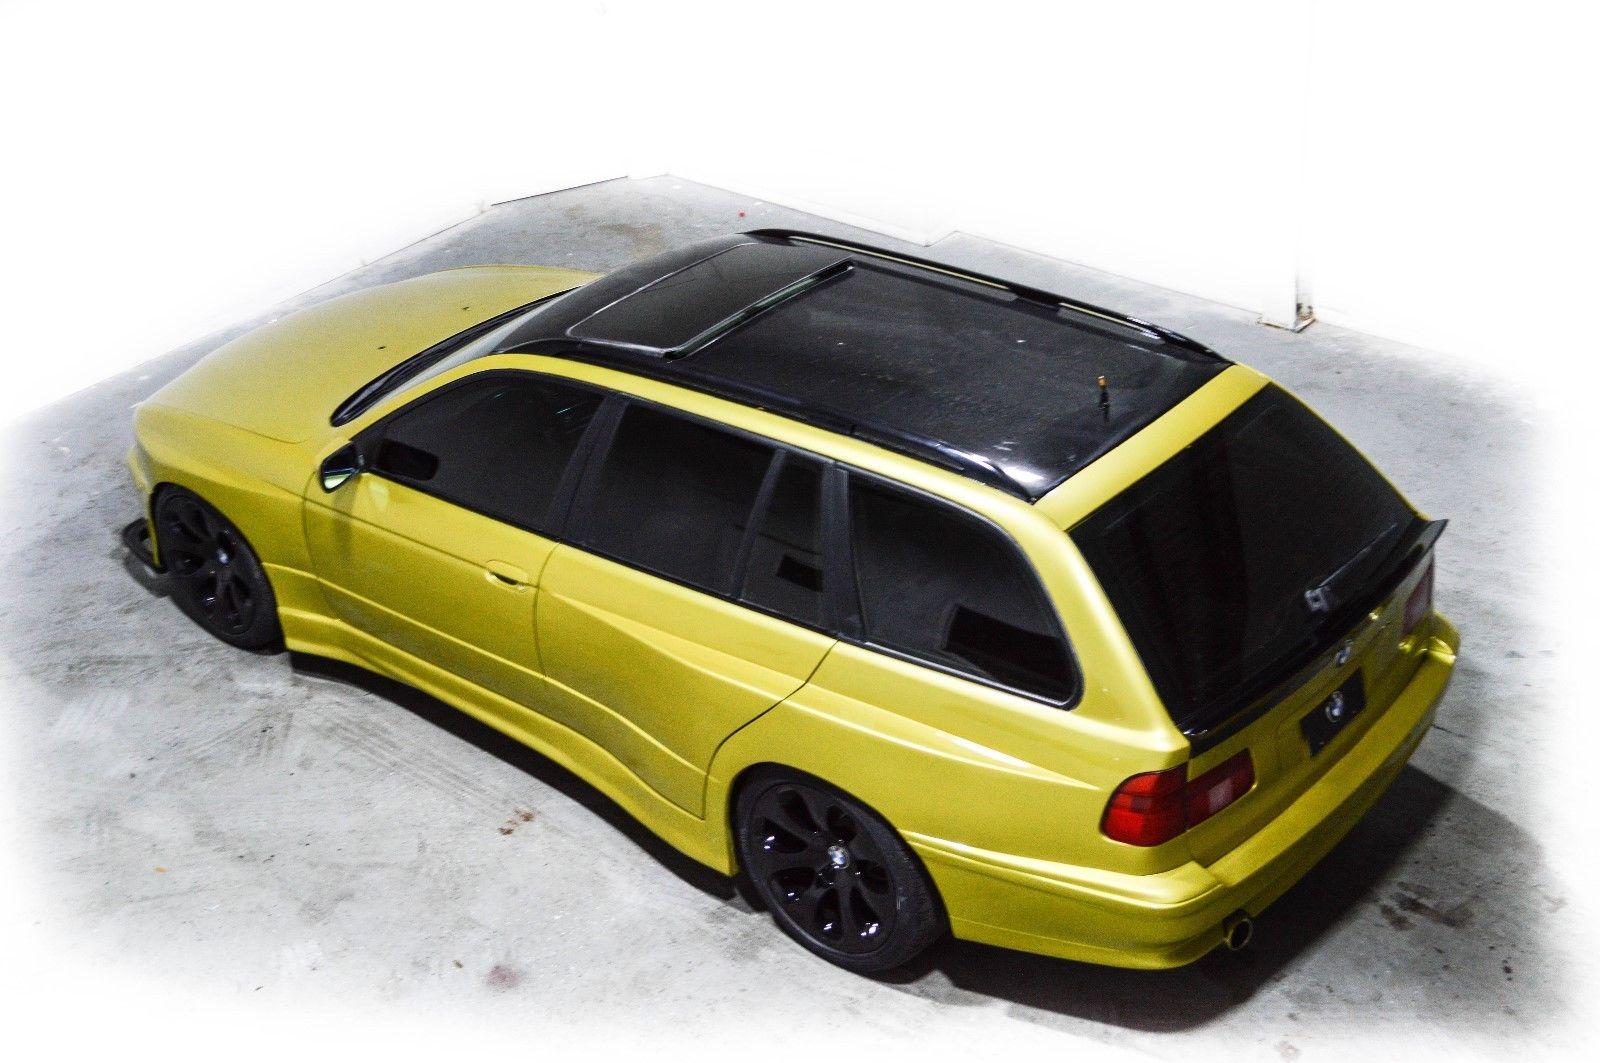 medium resolution of widebody wagon 2000 bmw 540i 6 speed